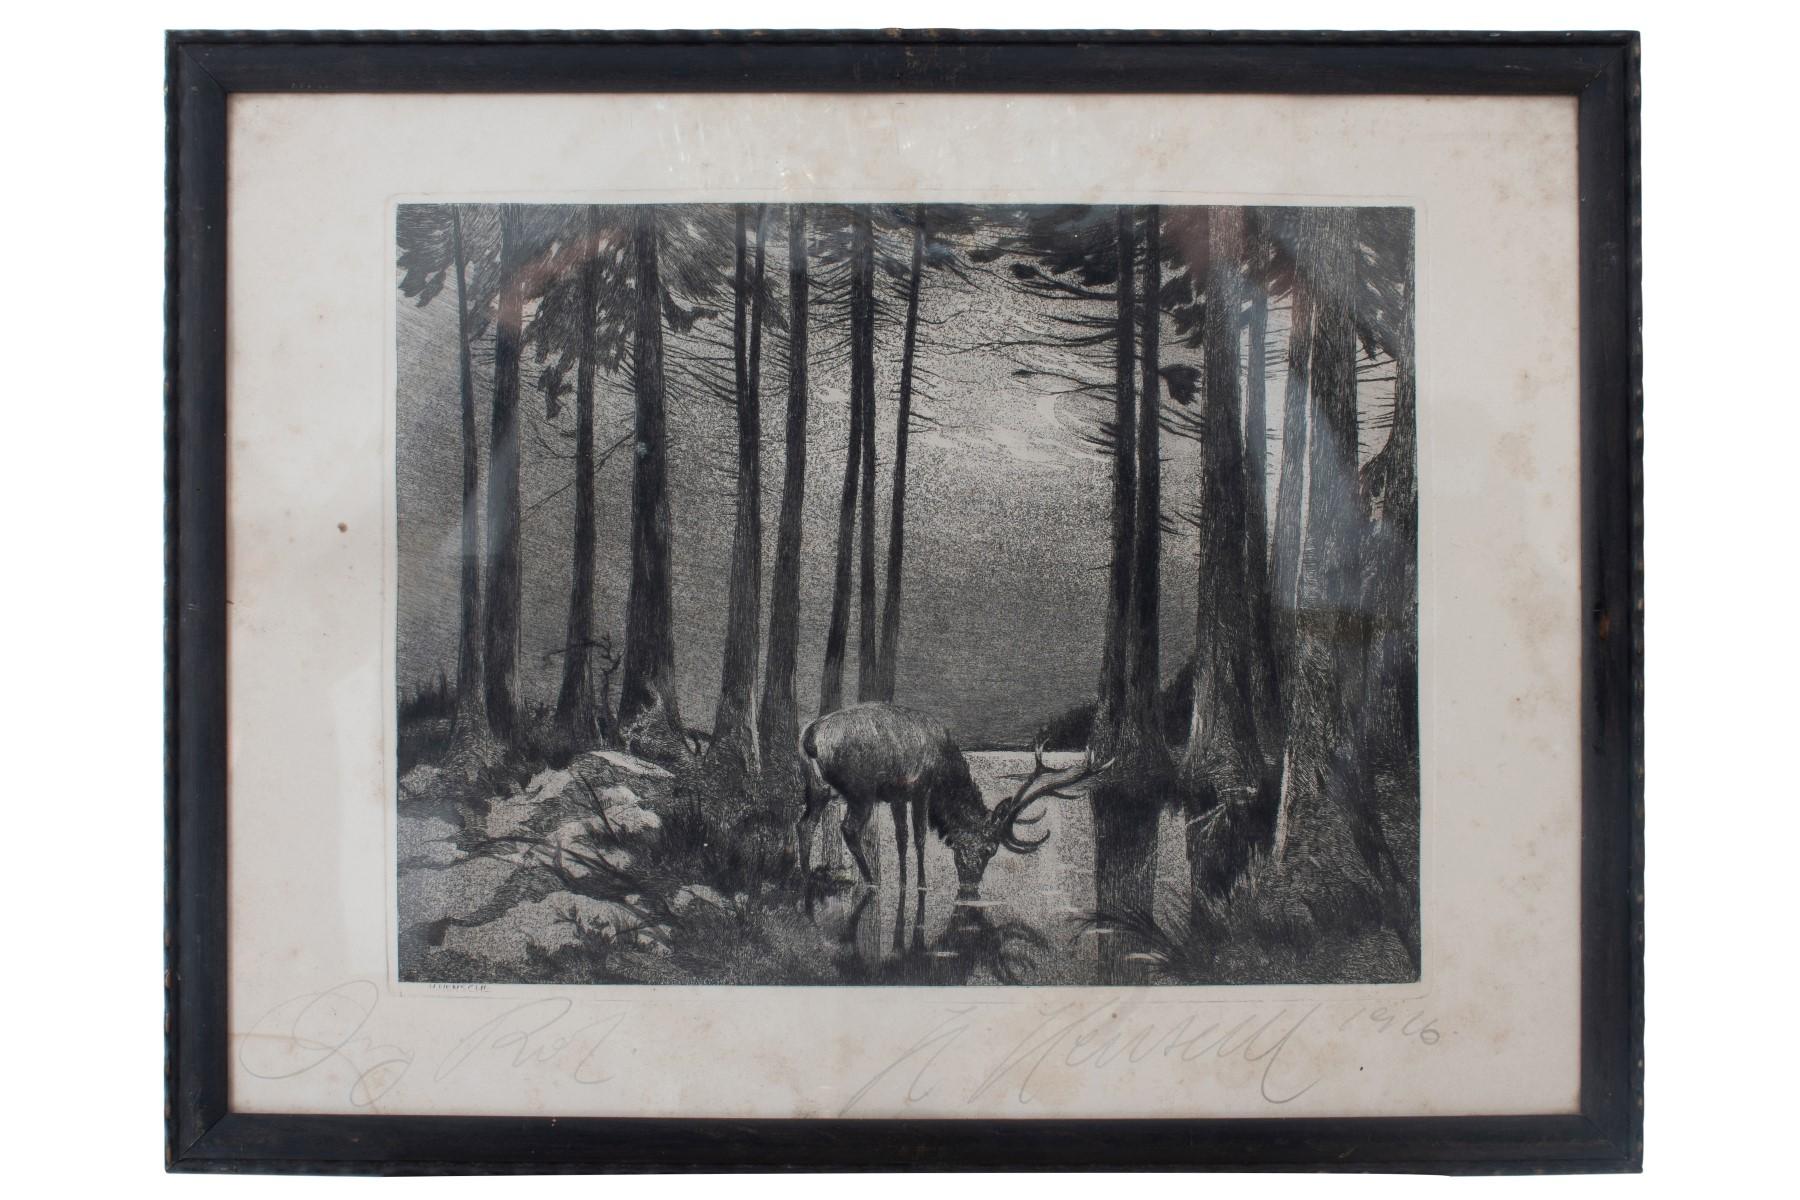 #42 Hugo Henschl (1879-1929) , Deer in the moonlight at the lake | Hugo Henschel (1879-1929) , Hirsch im Mondlicht am See Image